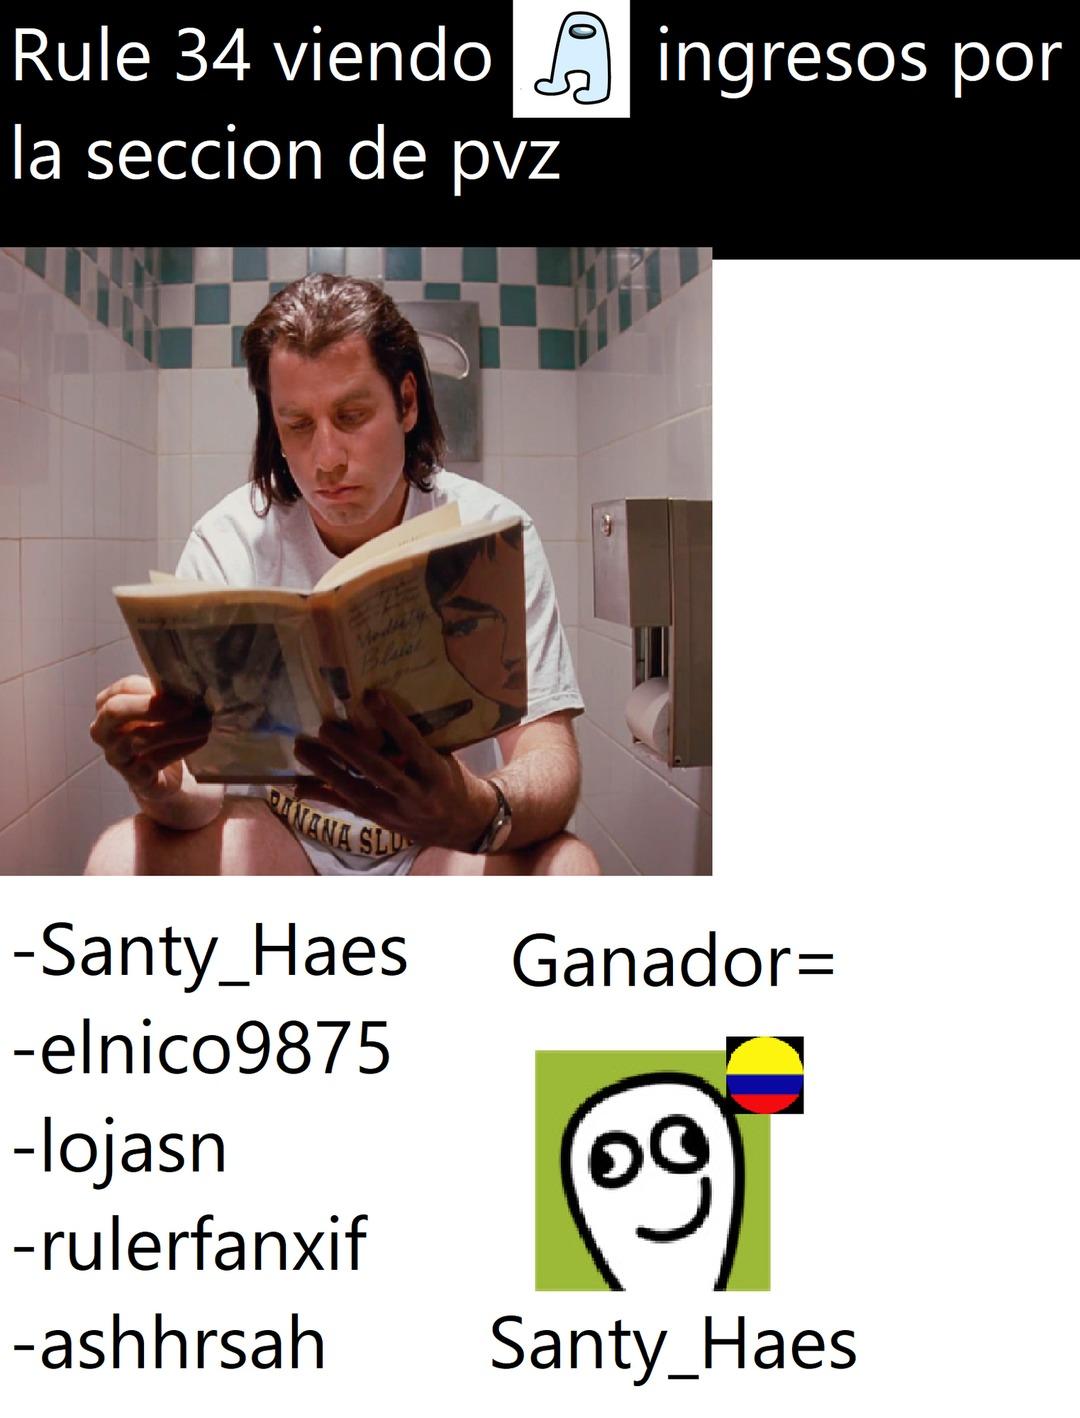 Santy_Haes ataka otra vez - meme